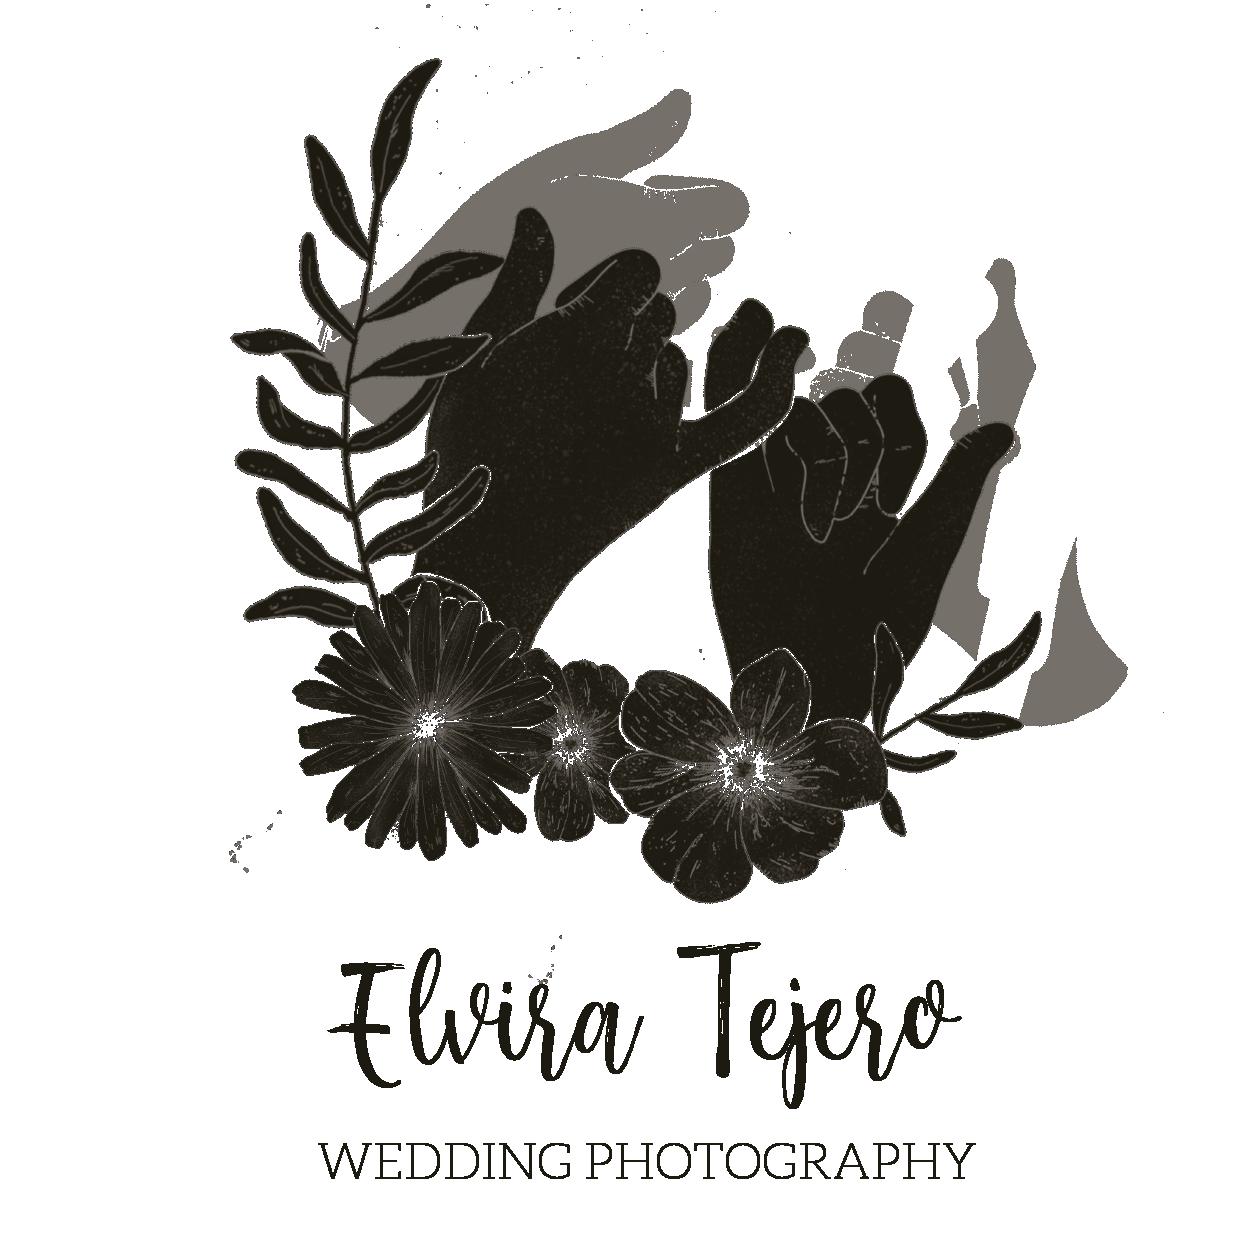 Elvira Tejero